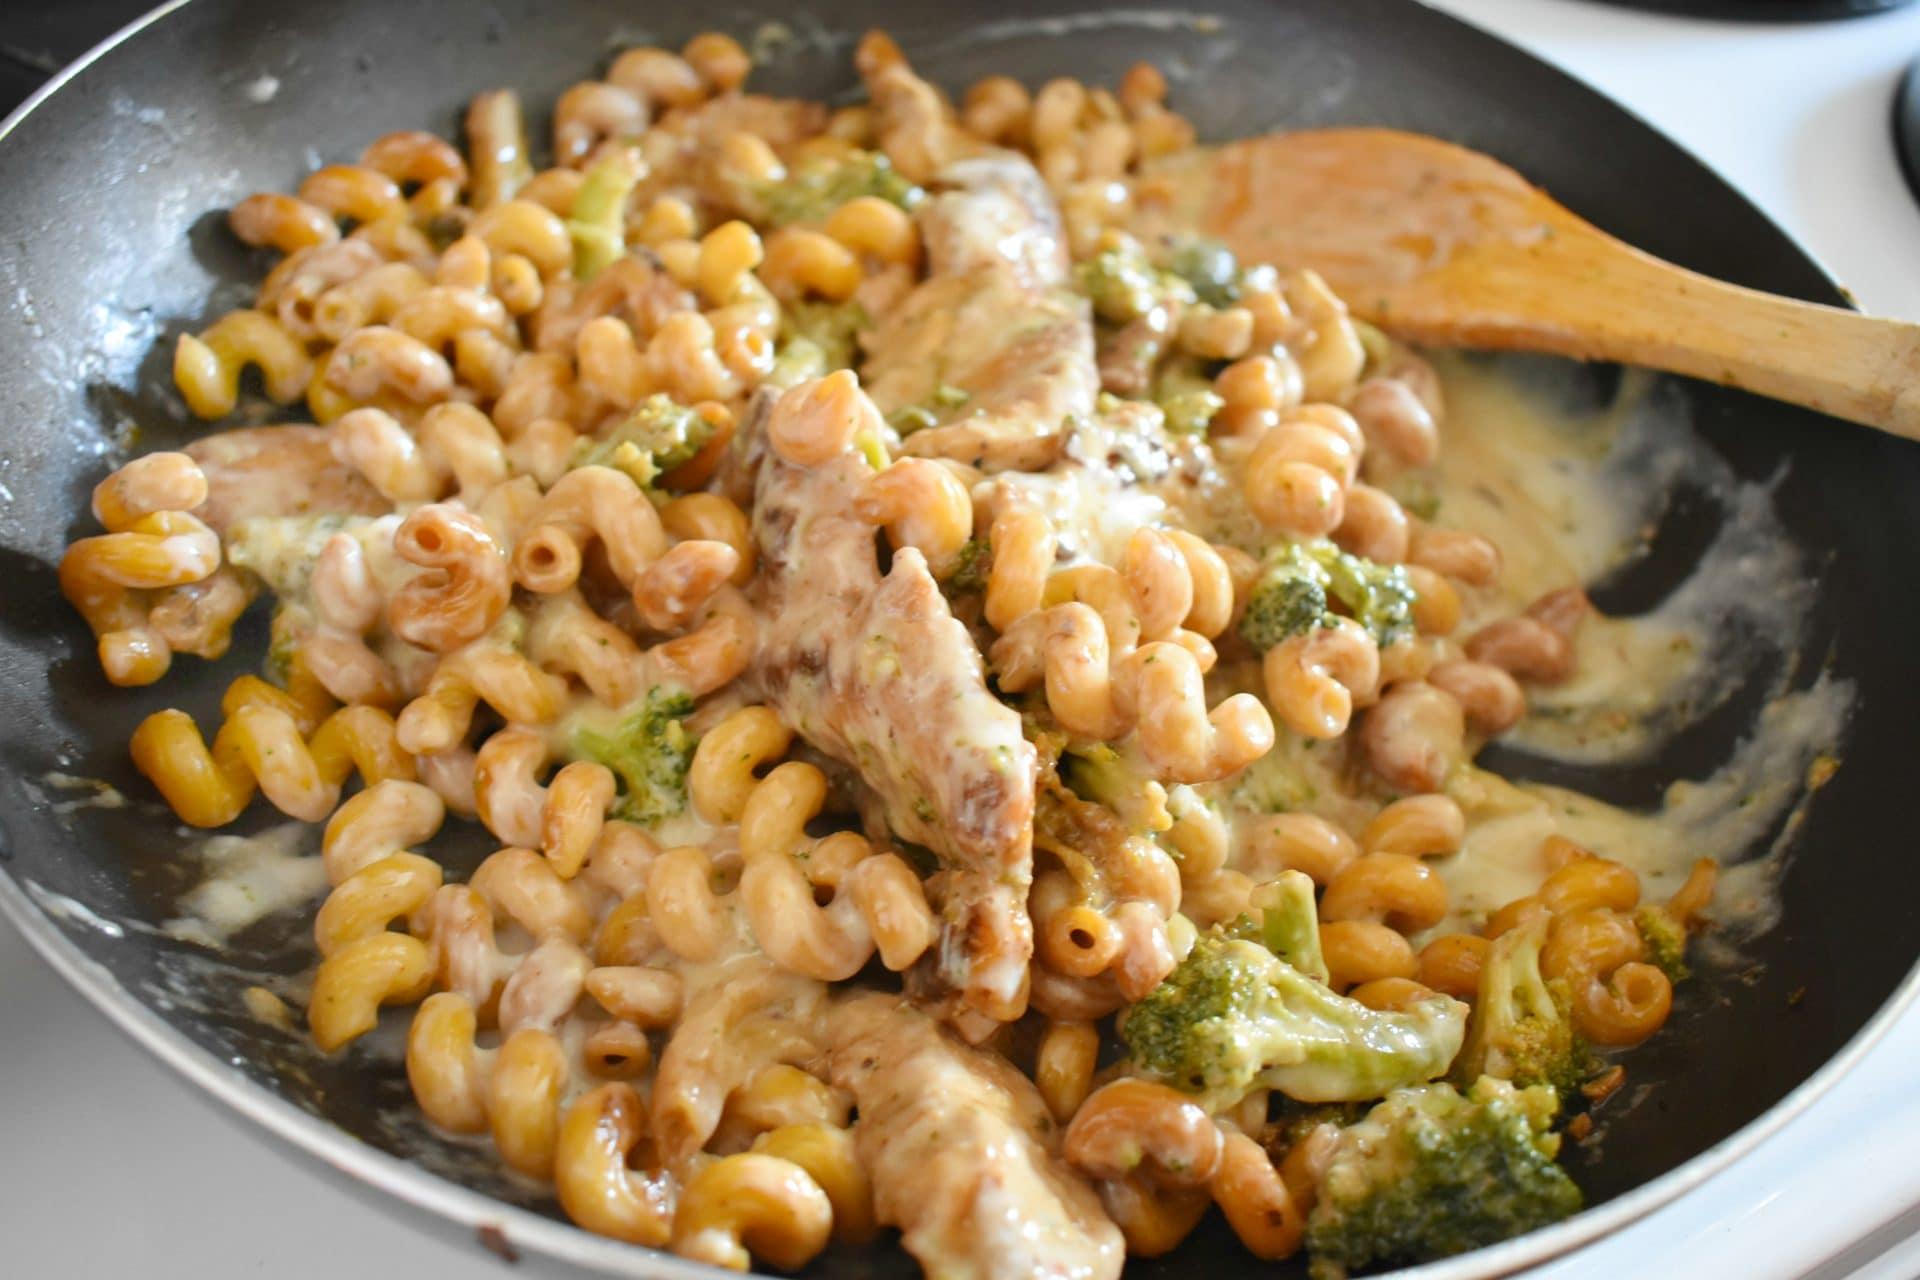 Ready to Serve Tyson Frozen Dinner Kit - Four Cheese Chicken & Broccoli Pasta